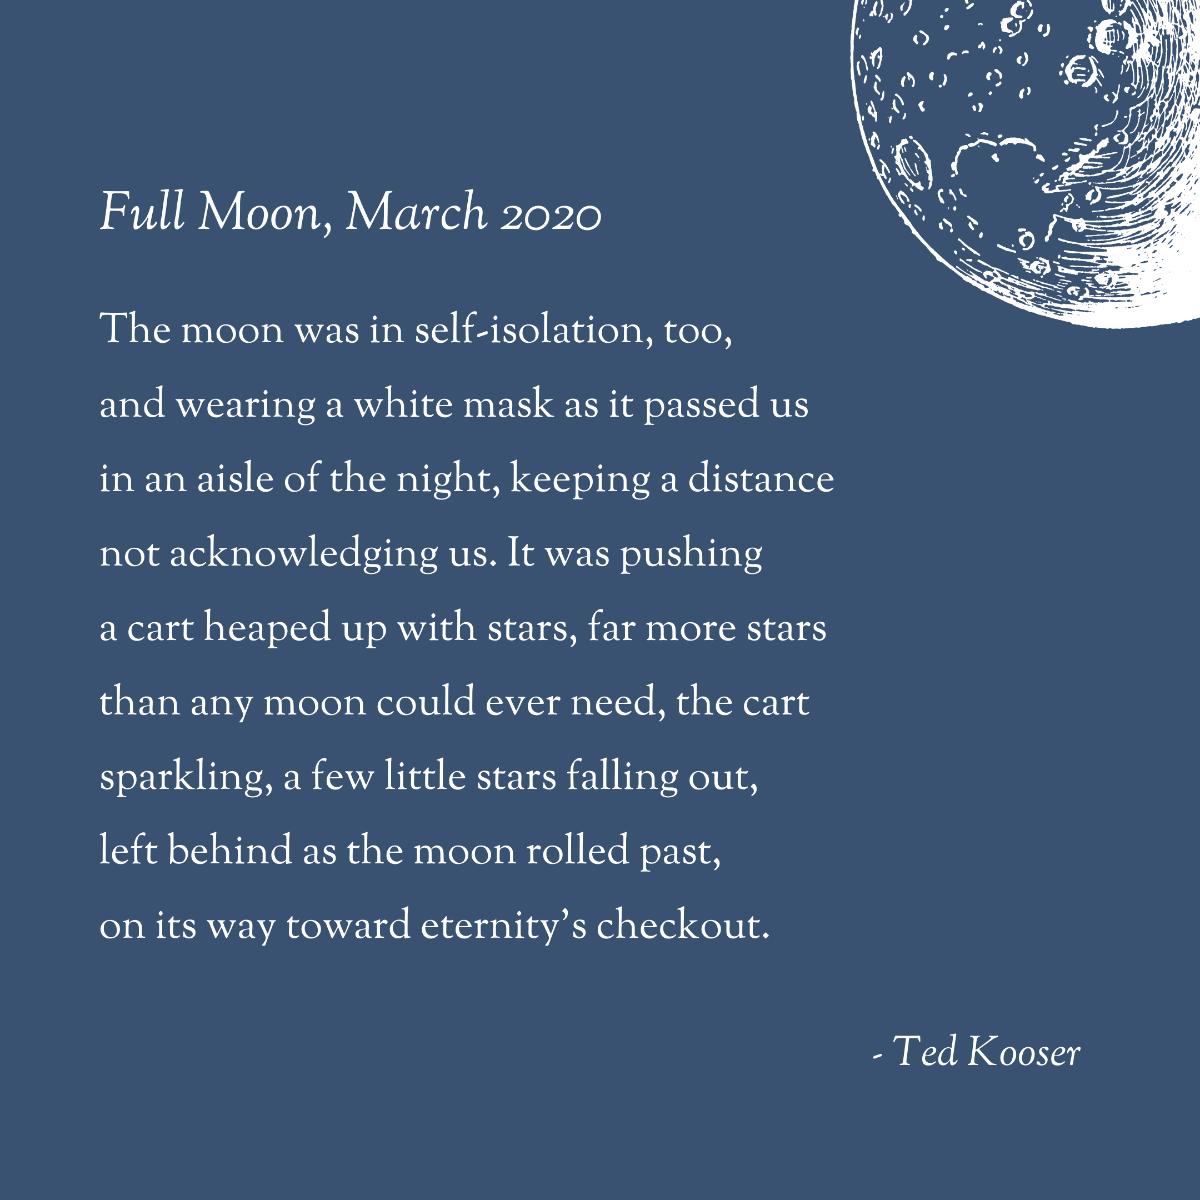 Full Moon, March 2020